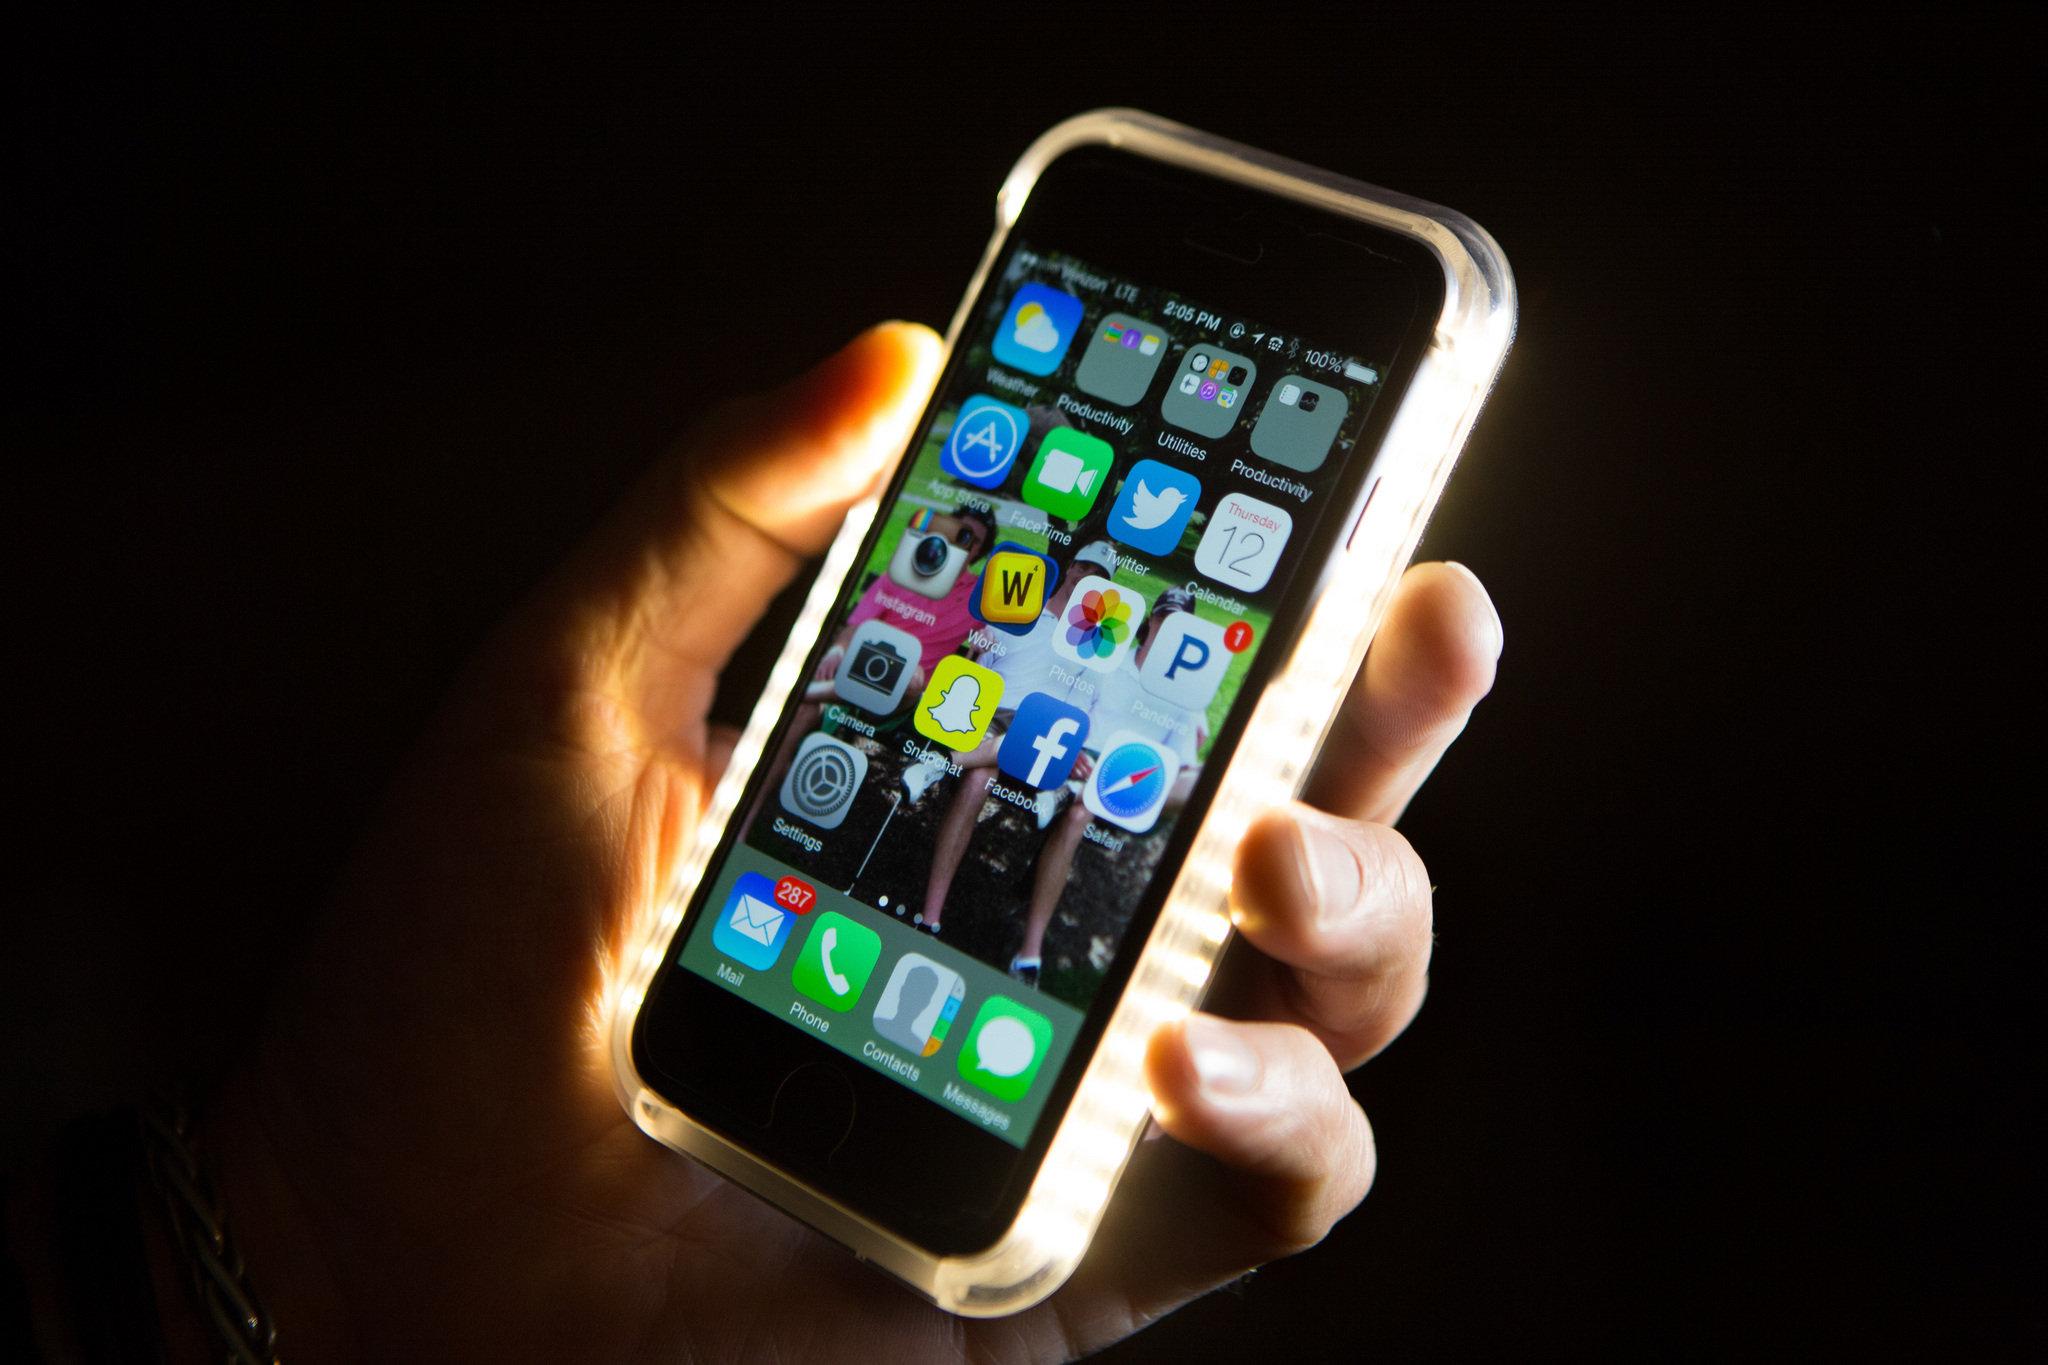 https://i1.wp.com/media.nj.com/entertainment_impact/photo/lumee-cellphone-case-49c19c10dc5bde1c.jpg